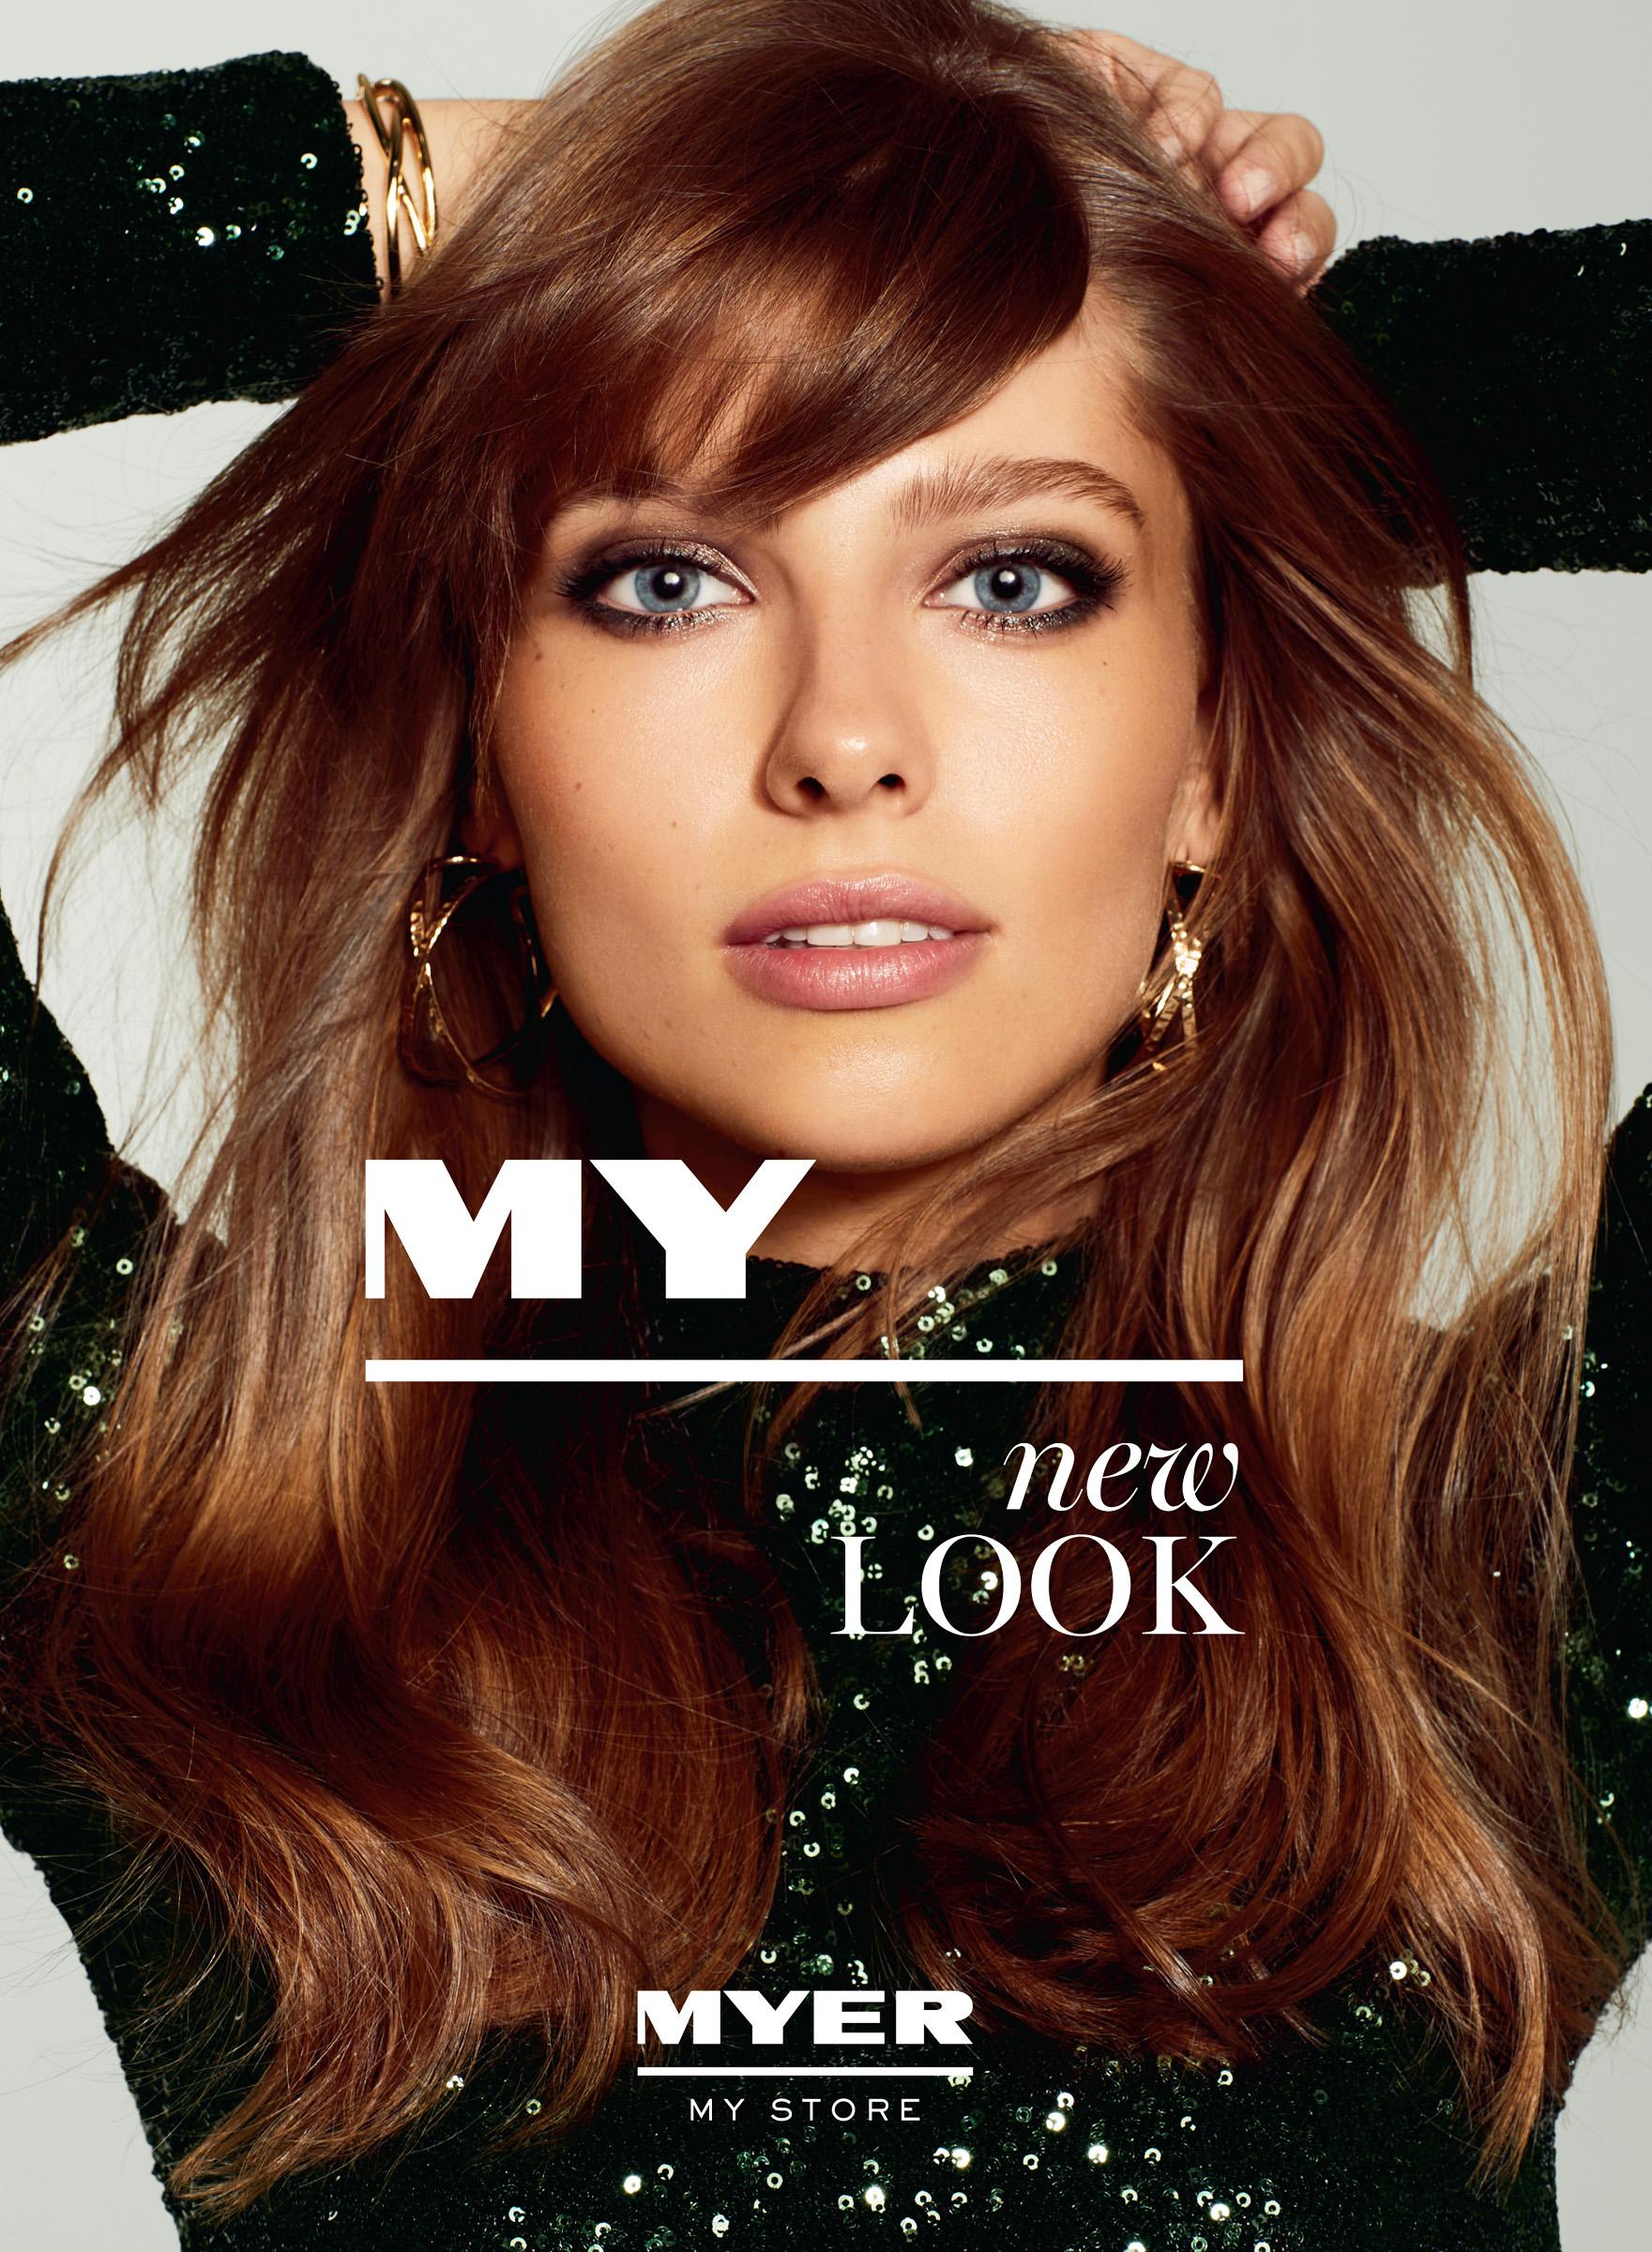 MYER4361_275x210_AW19_WK5_Season_Launch_Beauty_Fashion_Footwear_01_FA1_300.jpg